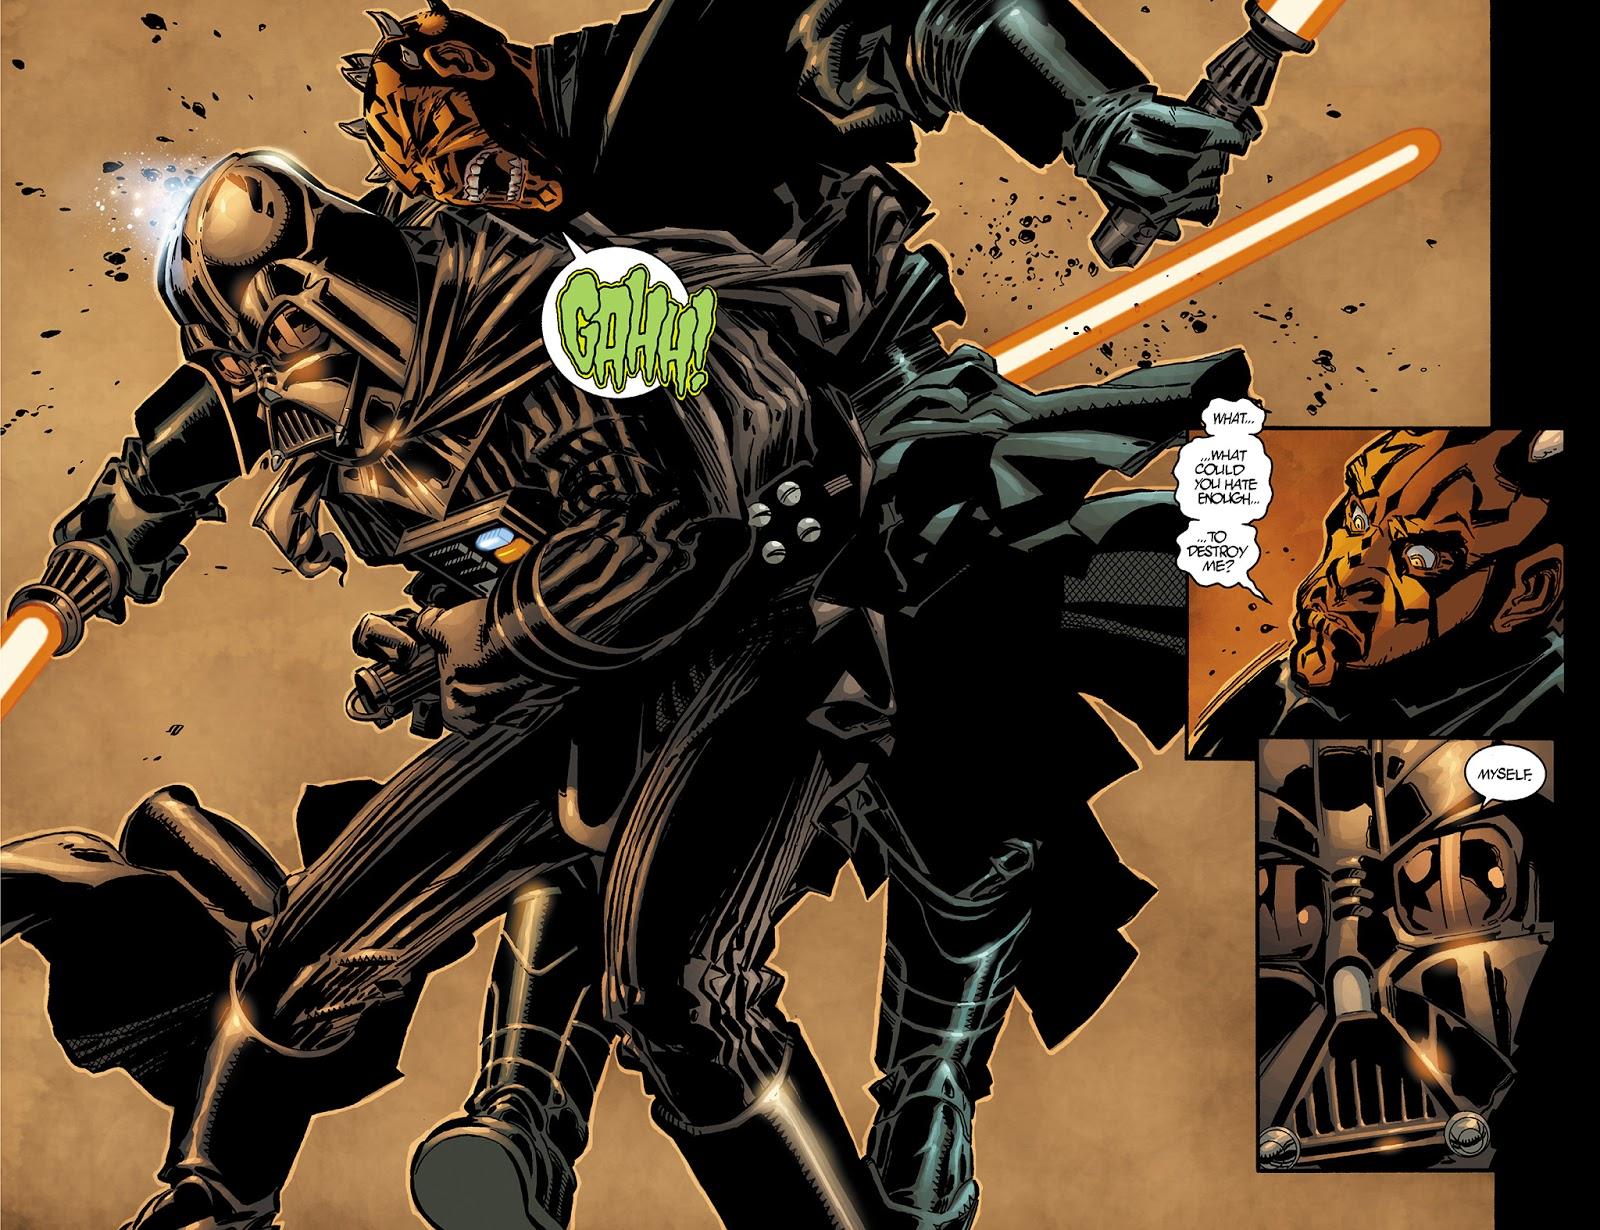 Darth Vader(ROTJ) vs Count Dooku(ROTS) vs Maul(SoD) - Page 4 Maul_v12